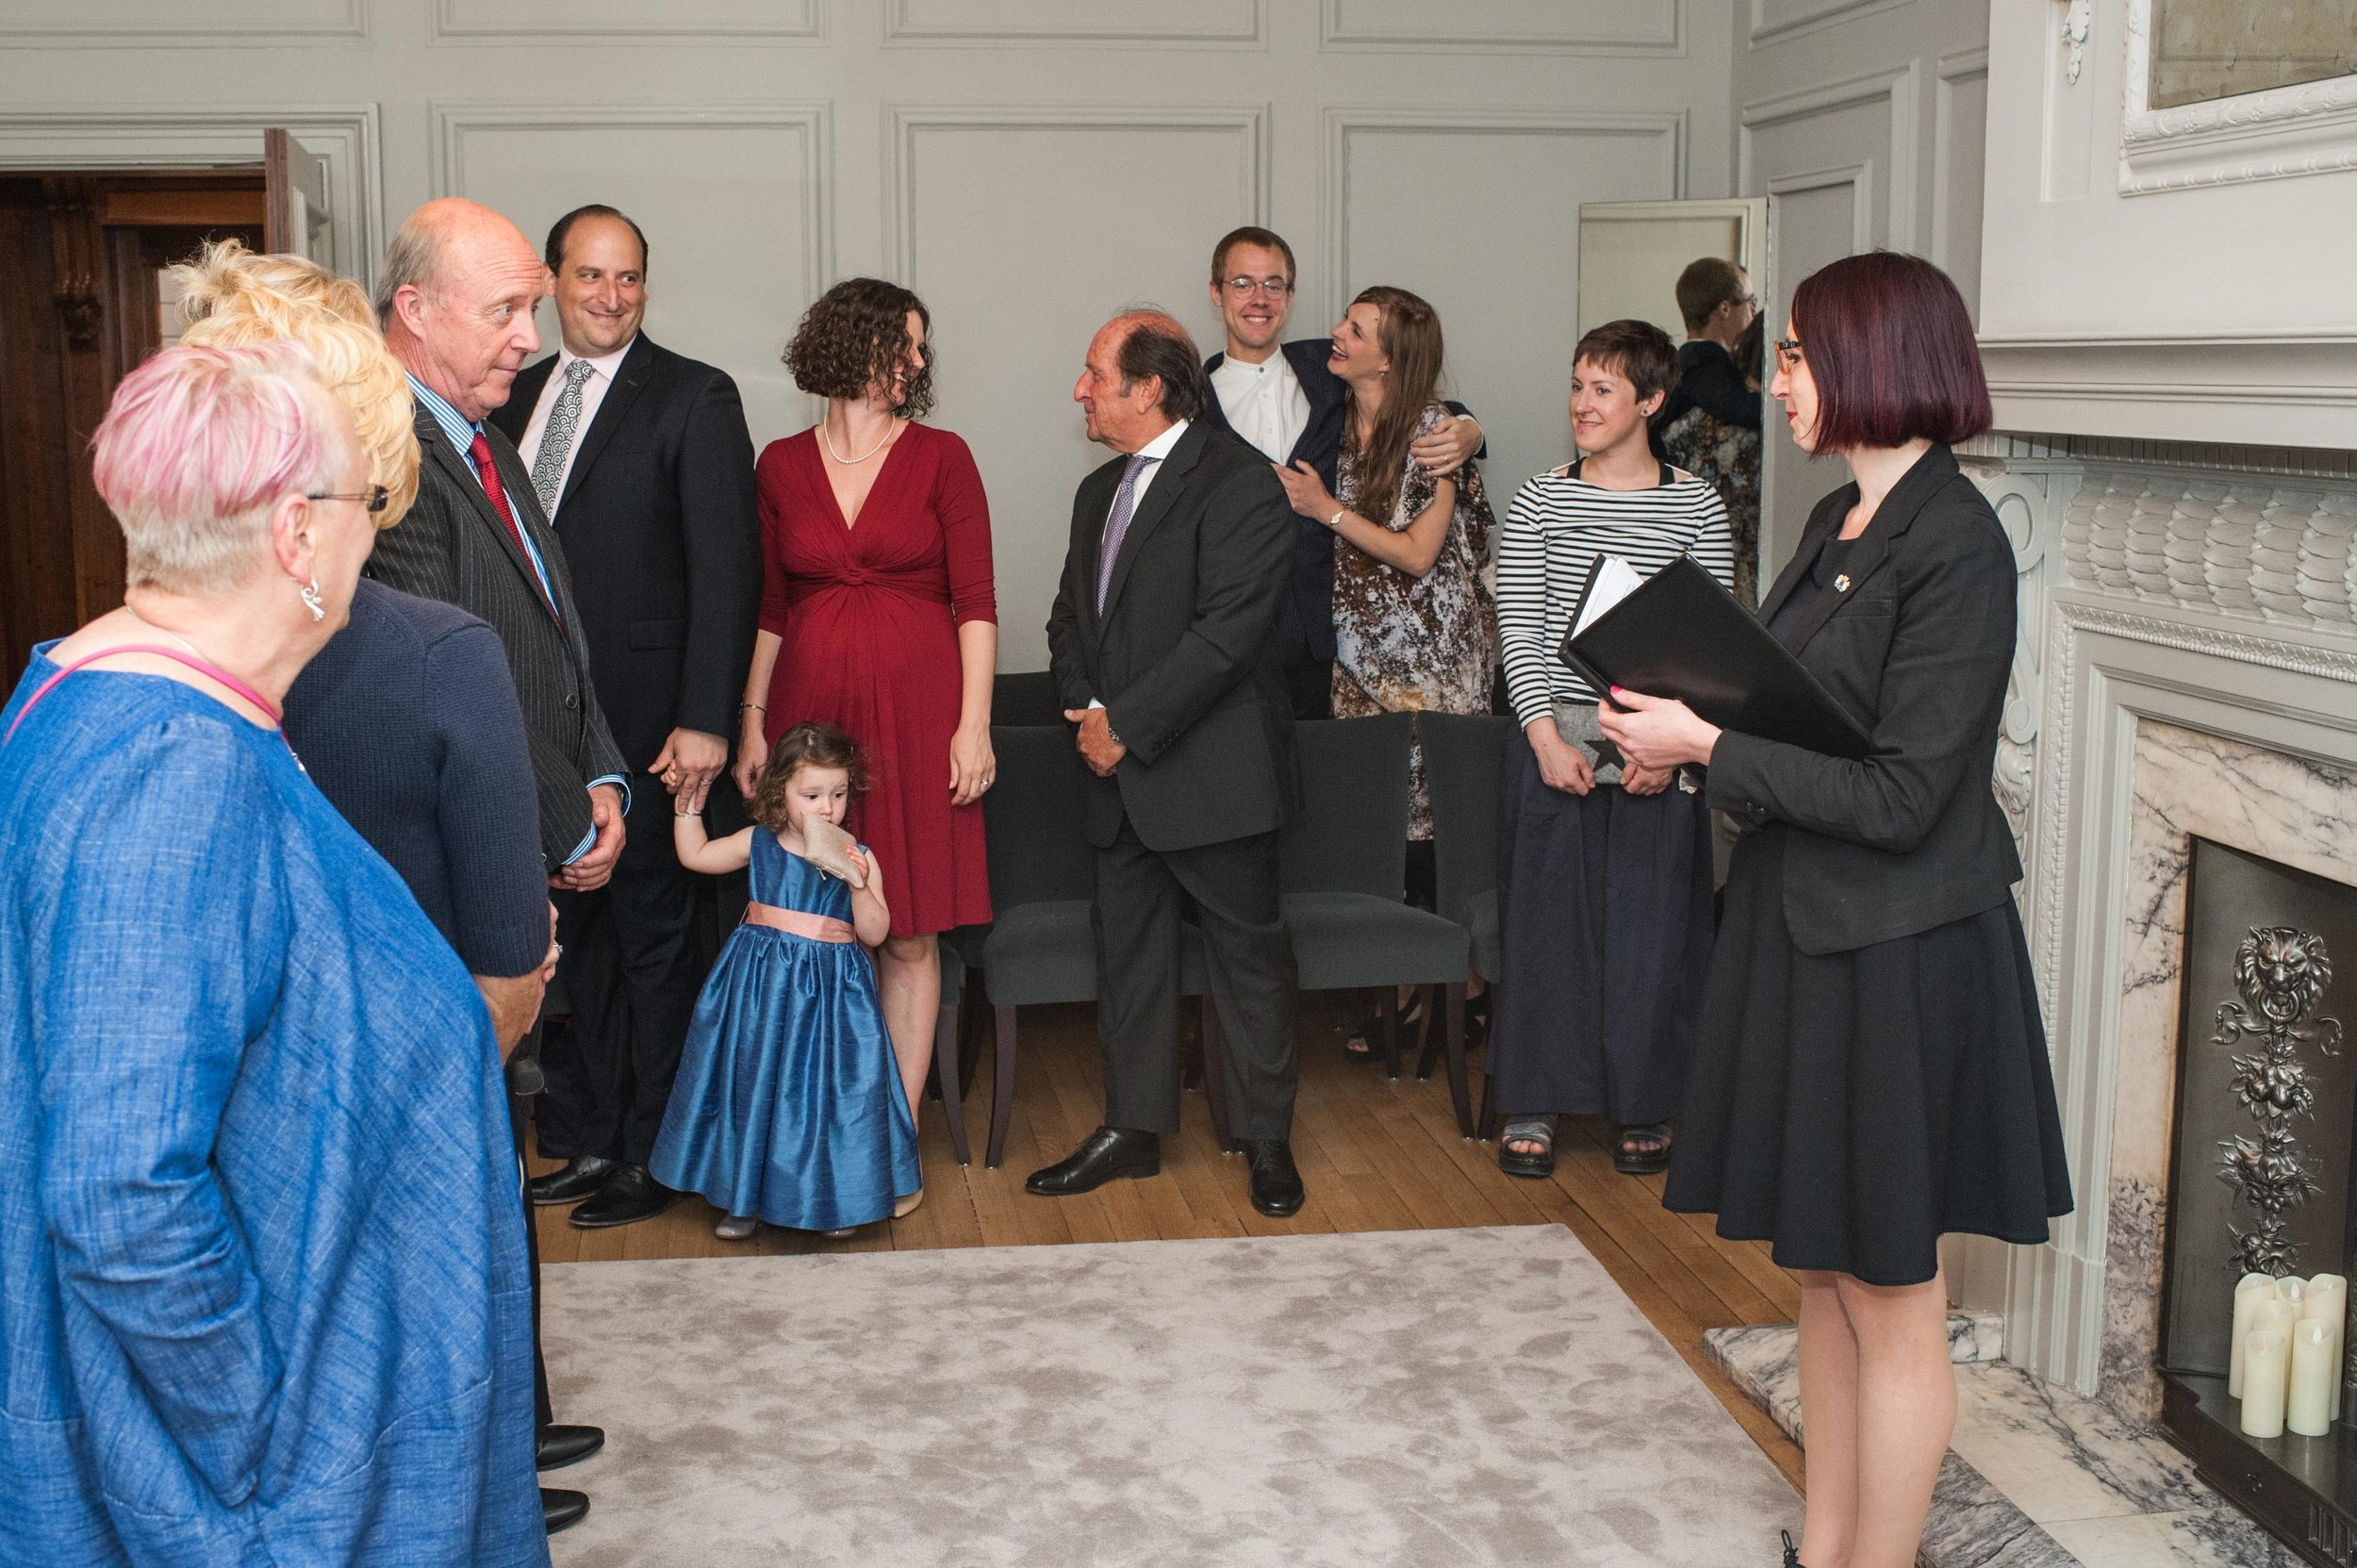 Wedding Photos_Small (77 of 232).jpg